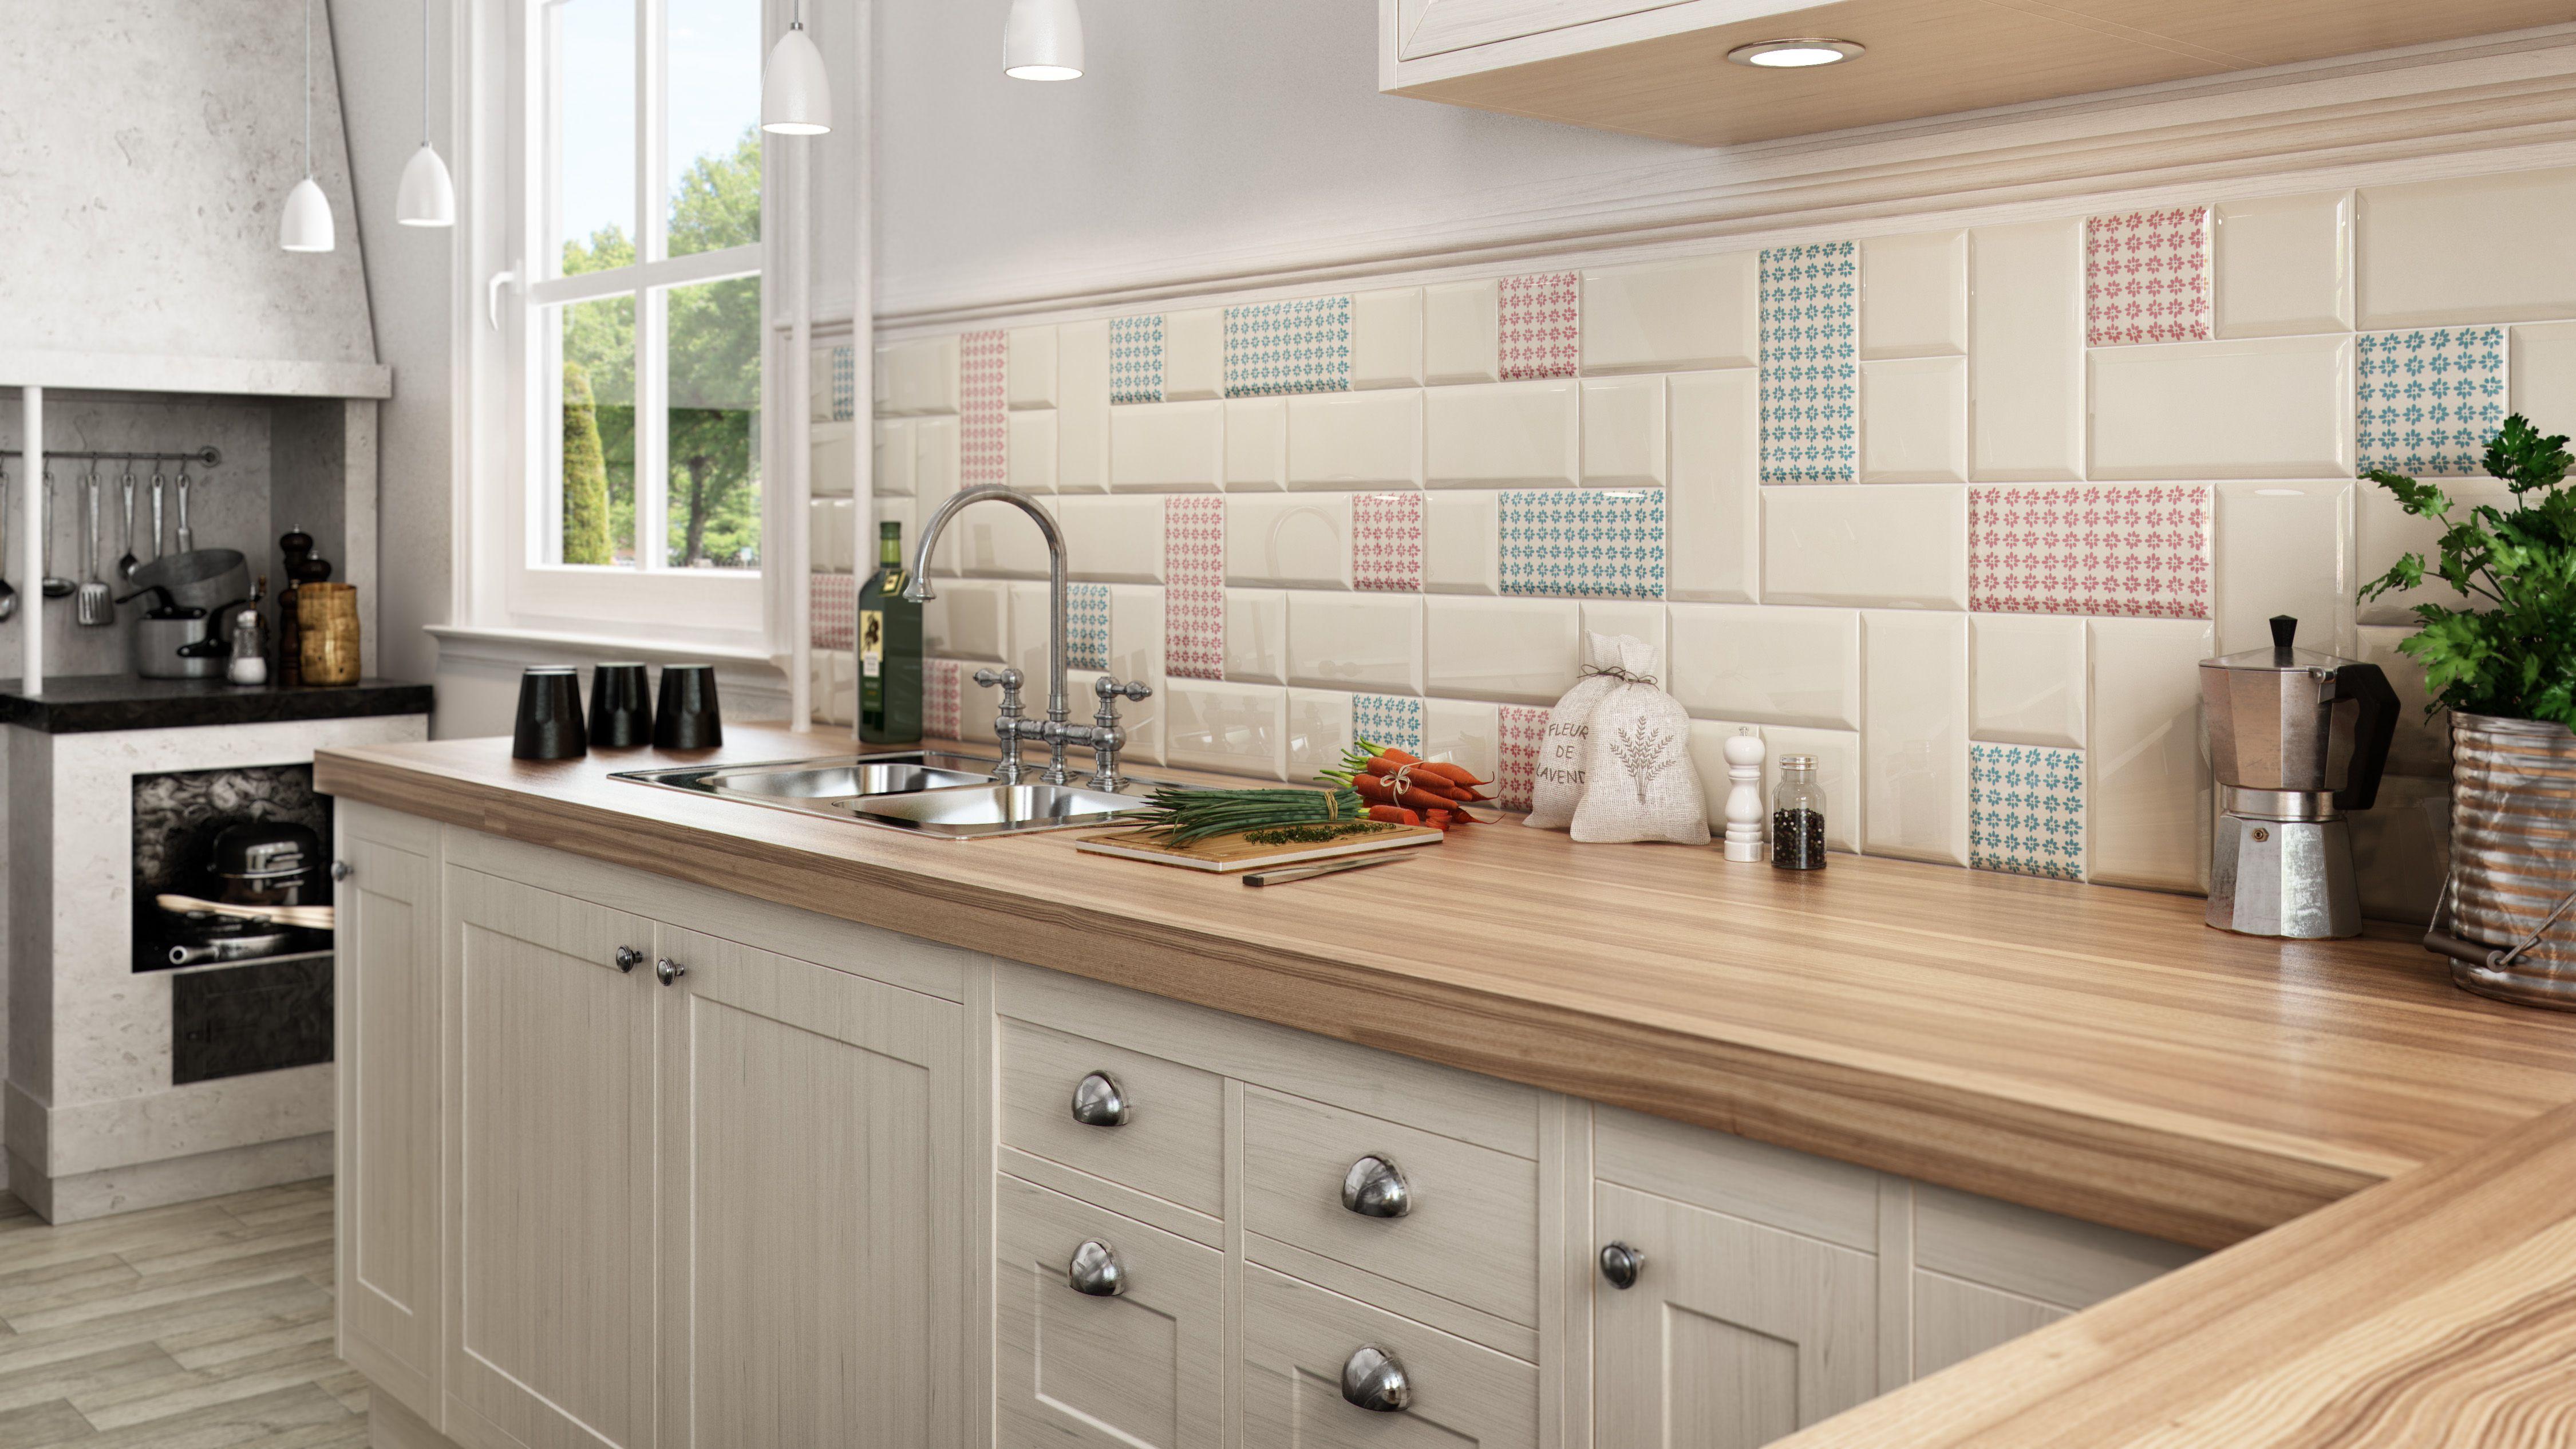 Ceramika Paradyz Kolor I Wzor W Kuchni Pln Design Kitchen Layout Kitchen Home